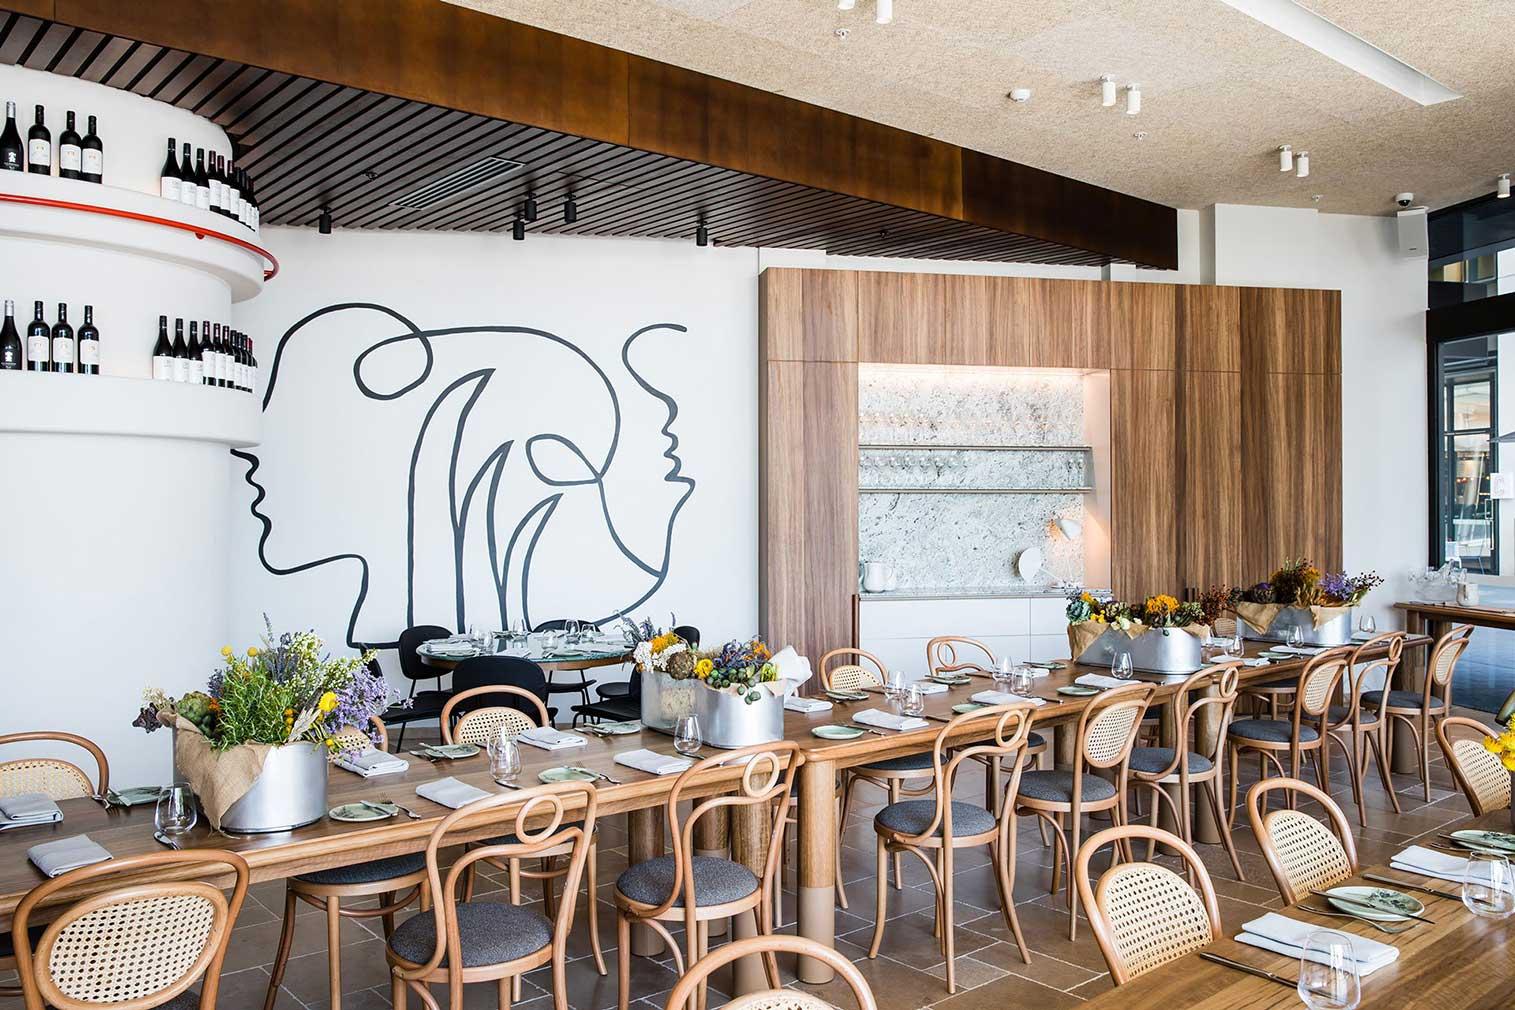 Été restaurant in Sydney